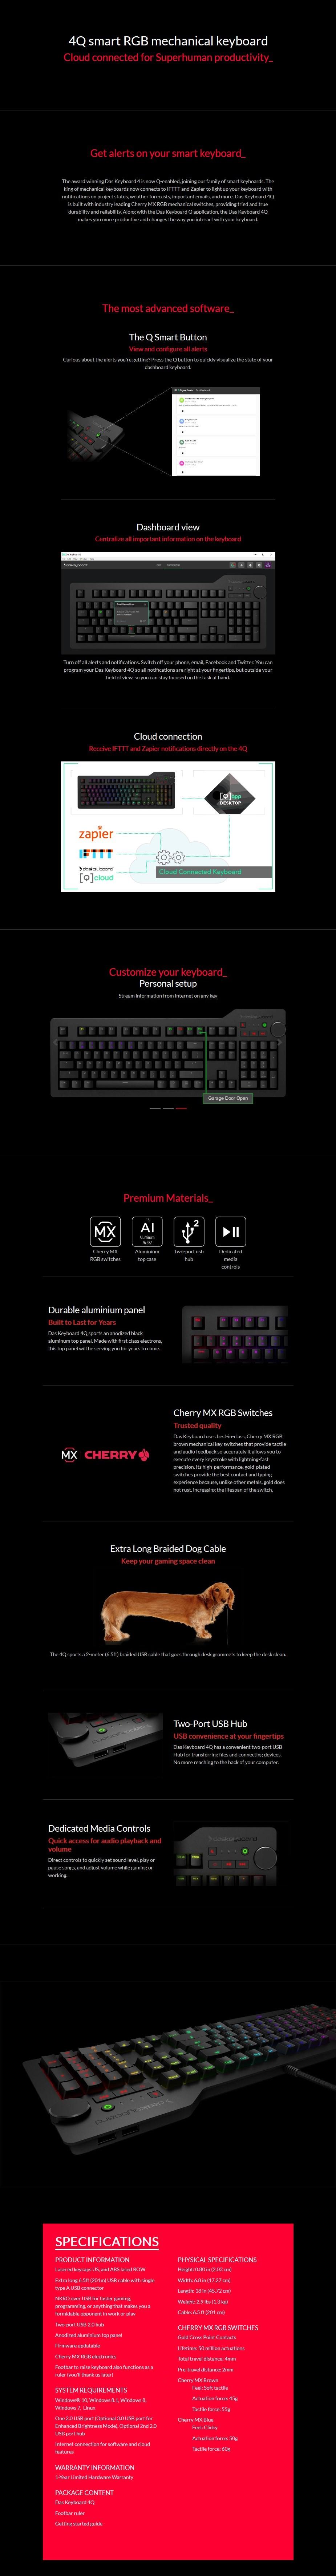 Das Keyboard 4Q Soft Tactile RGB Smart Mechanical Keyboard - Cherry MX Brown - Desktop Overview 1